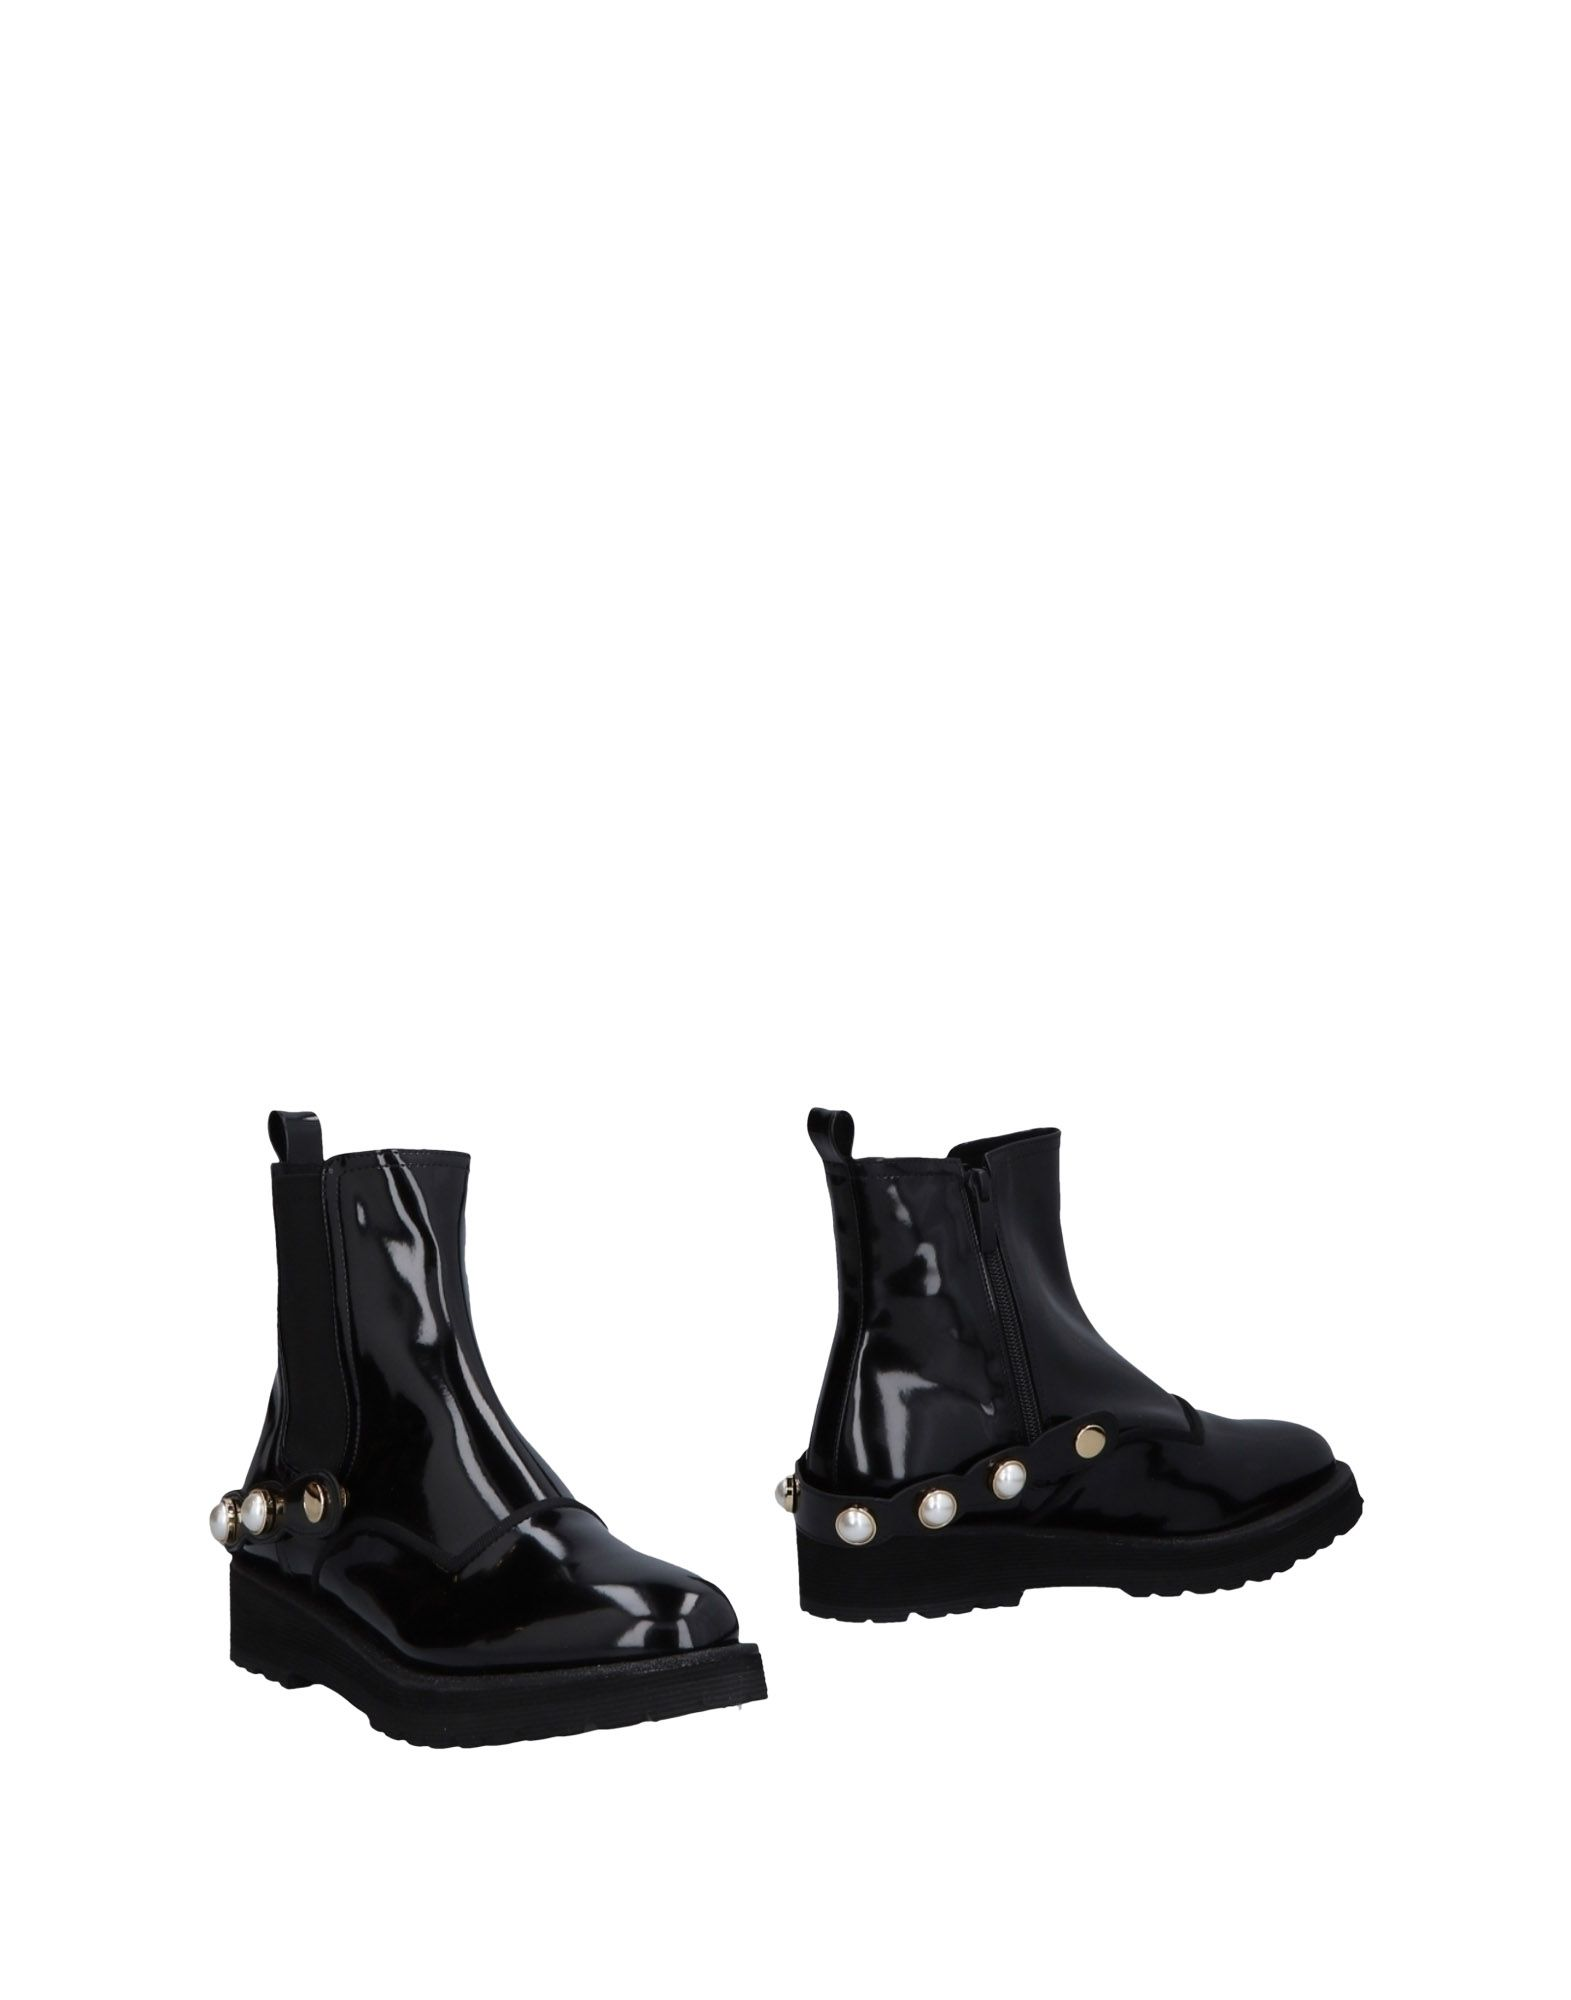 Suecomma Bonnie Chelsea Boots strapazierfähige Damen  11476504EUGut aussehende strapazierfähige Boots Schuhe aefdf6